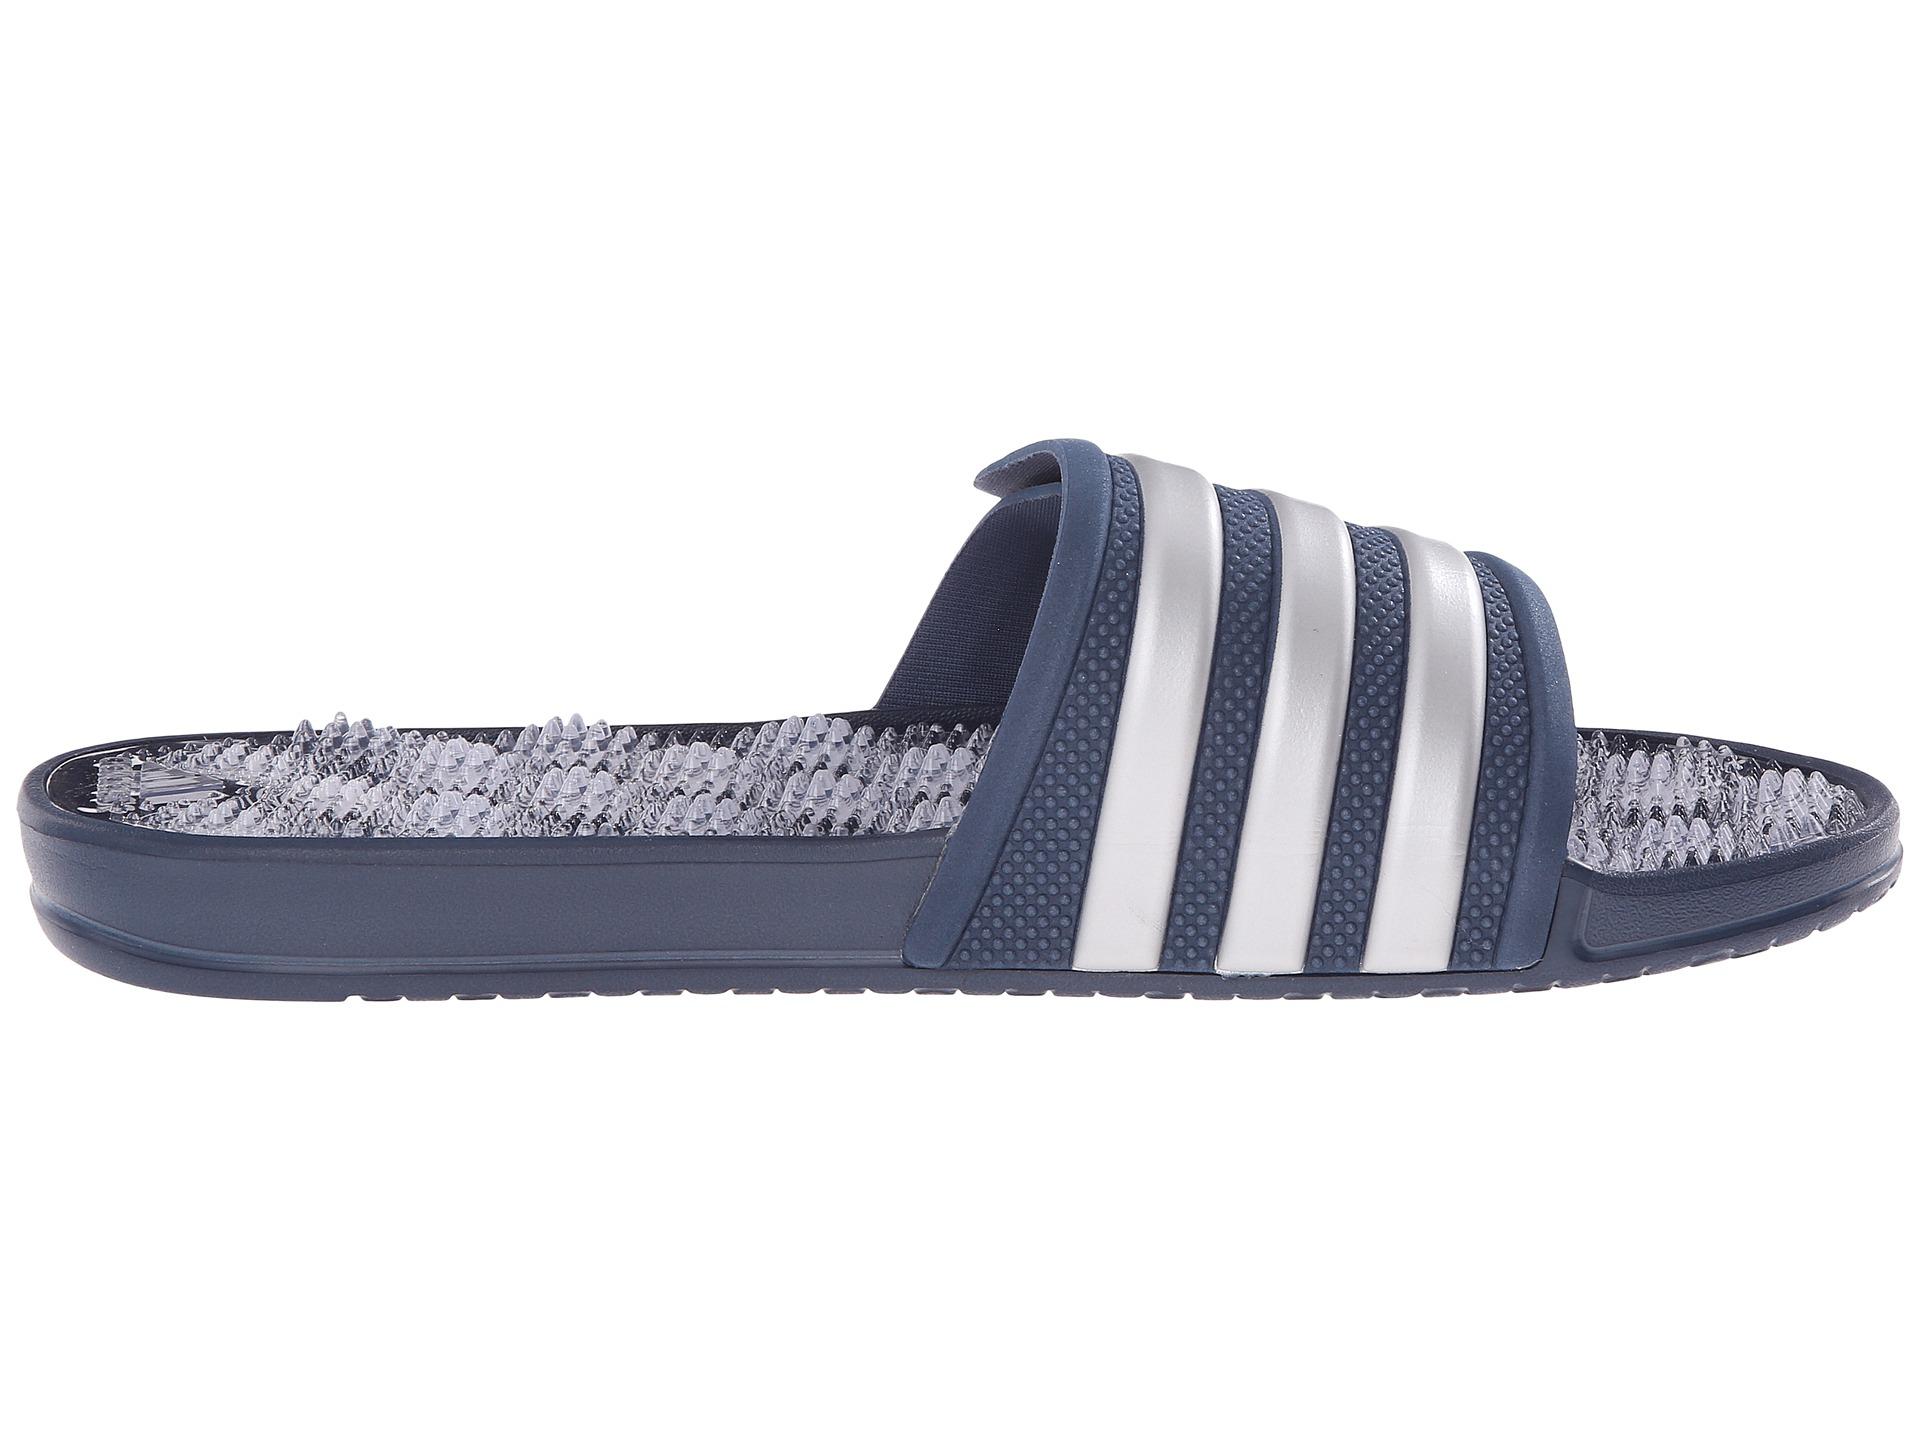 92cc9c0e7e3288 Lyst - adidas Originals Adissage 2.0 M Stripe in Blue for Men